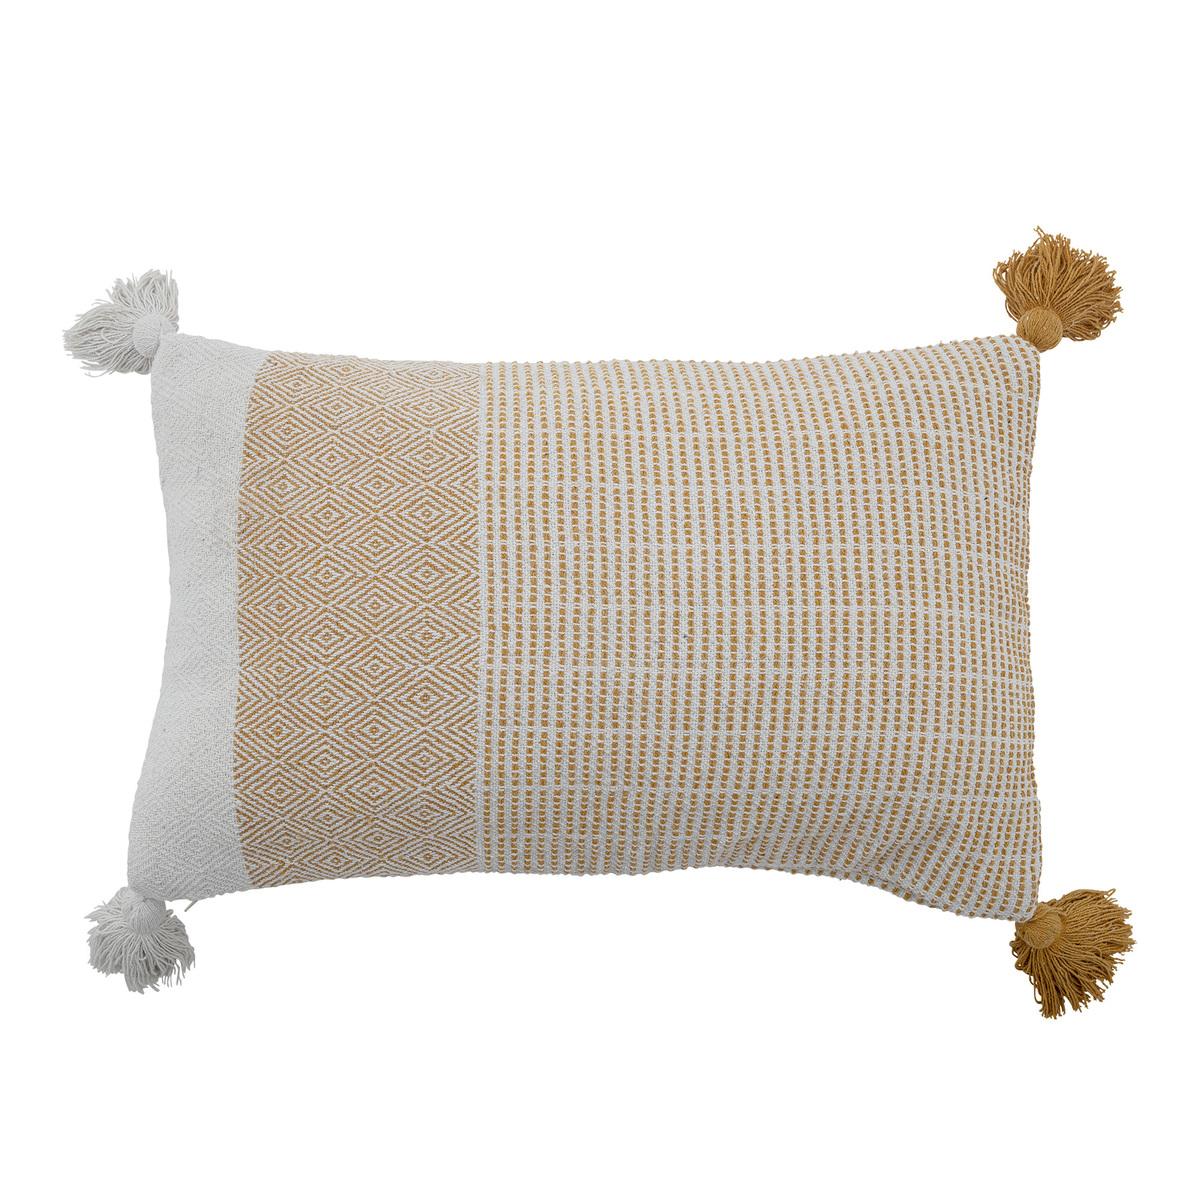 Demi polštářek, žlutý, recyklovaná bavlna